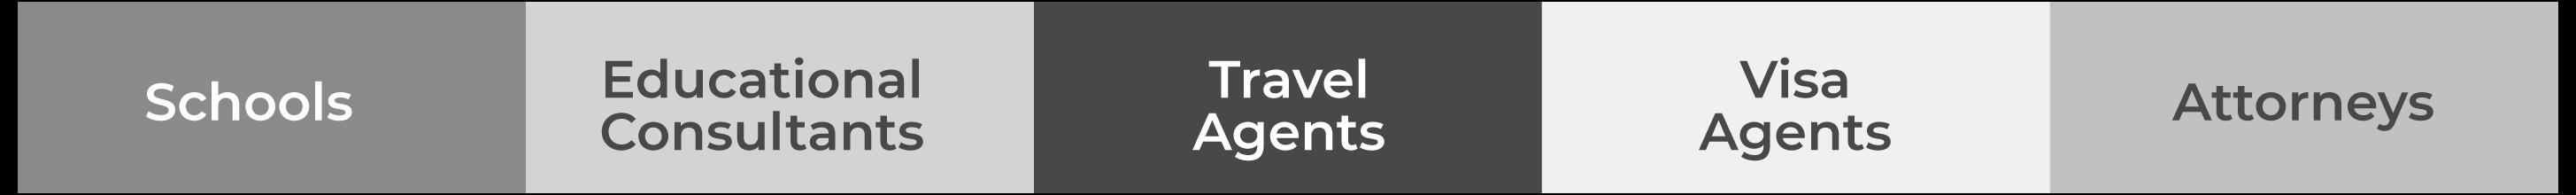 Schools, Educational Consultants, Travel Agents, Visa Agents, Attorneys.